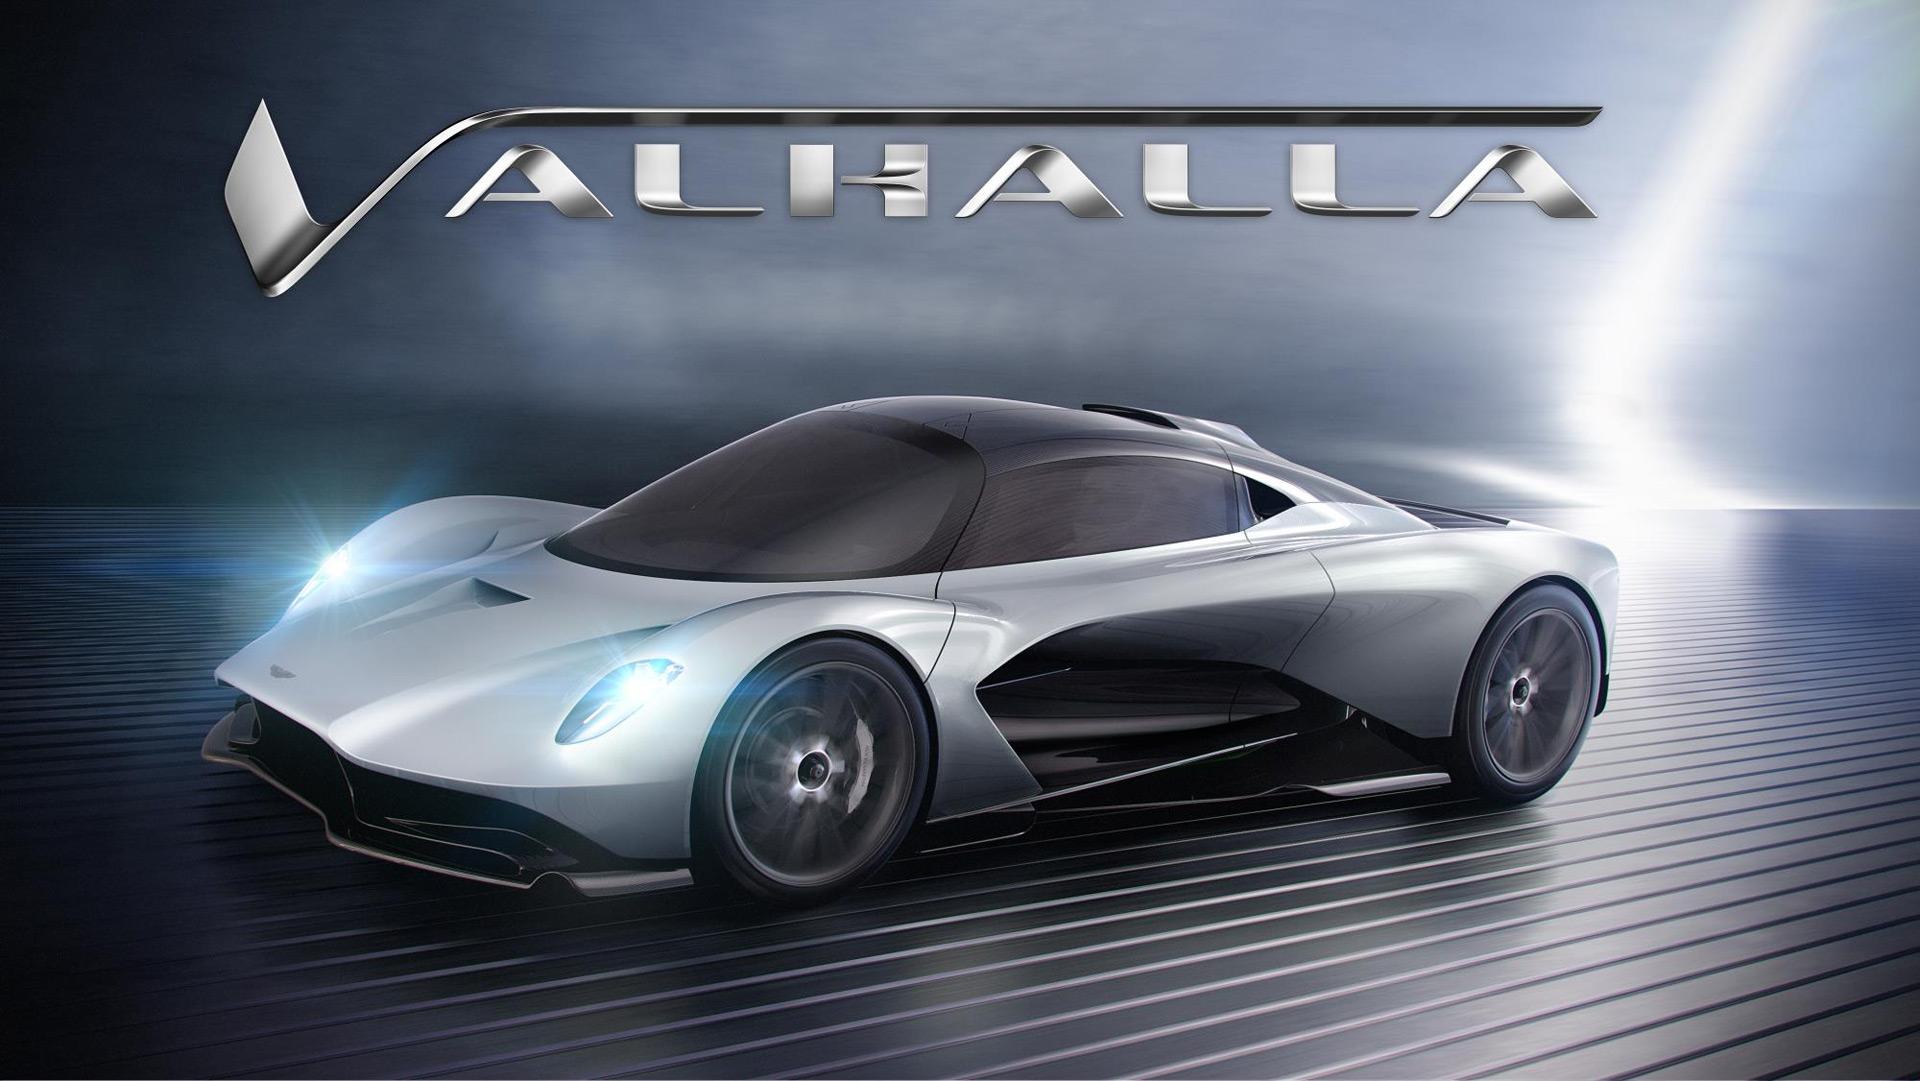 New Aston Martin >> Aston Martin Valhalla Is New Name For Am Rb 003 Hypercar